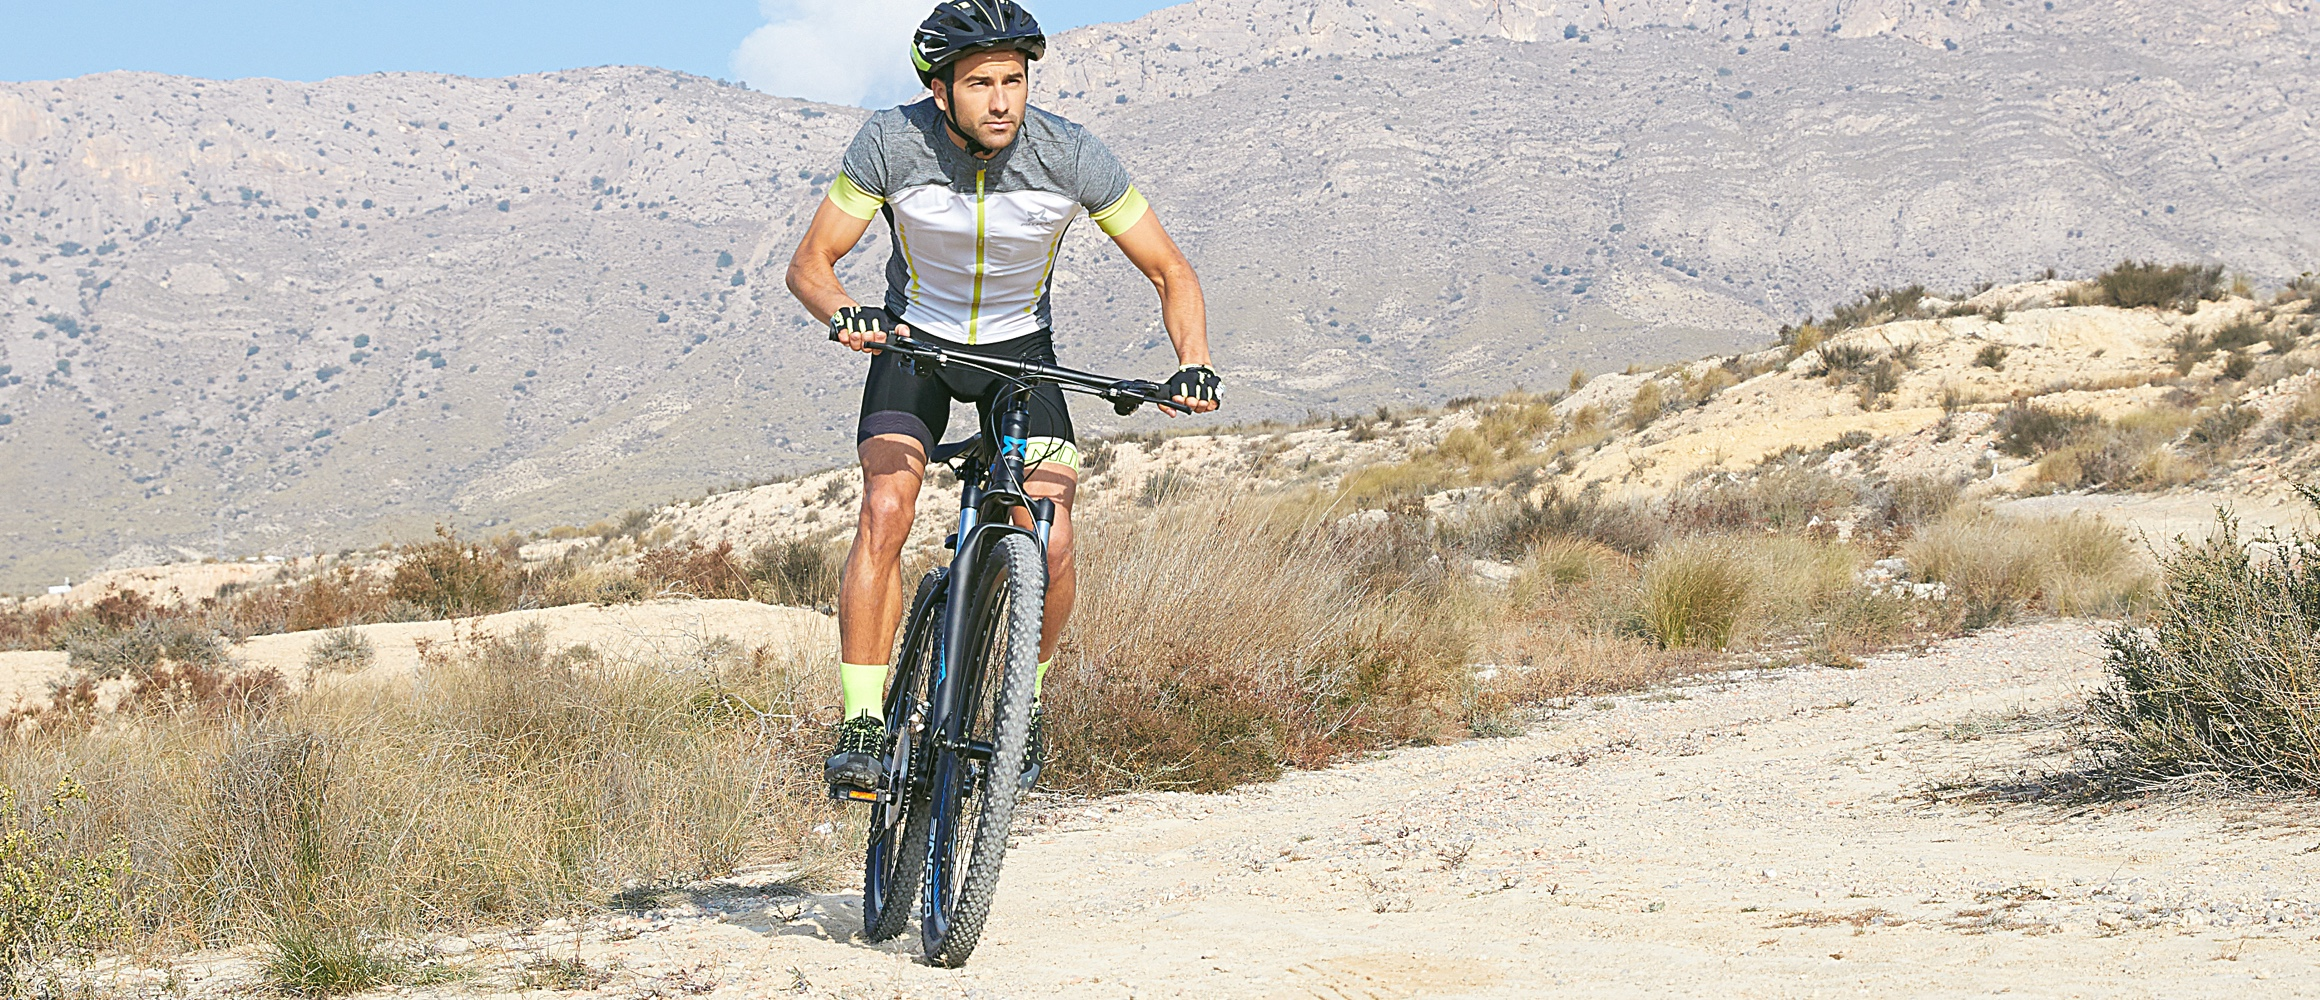 Cesc Godoy / Triatleta profesional